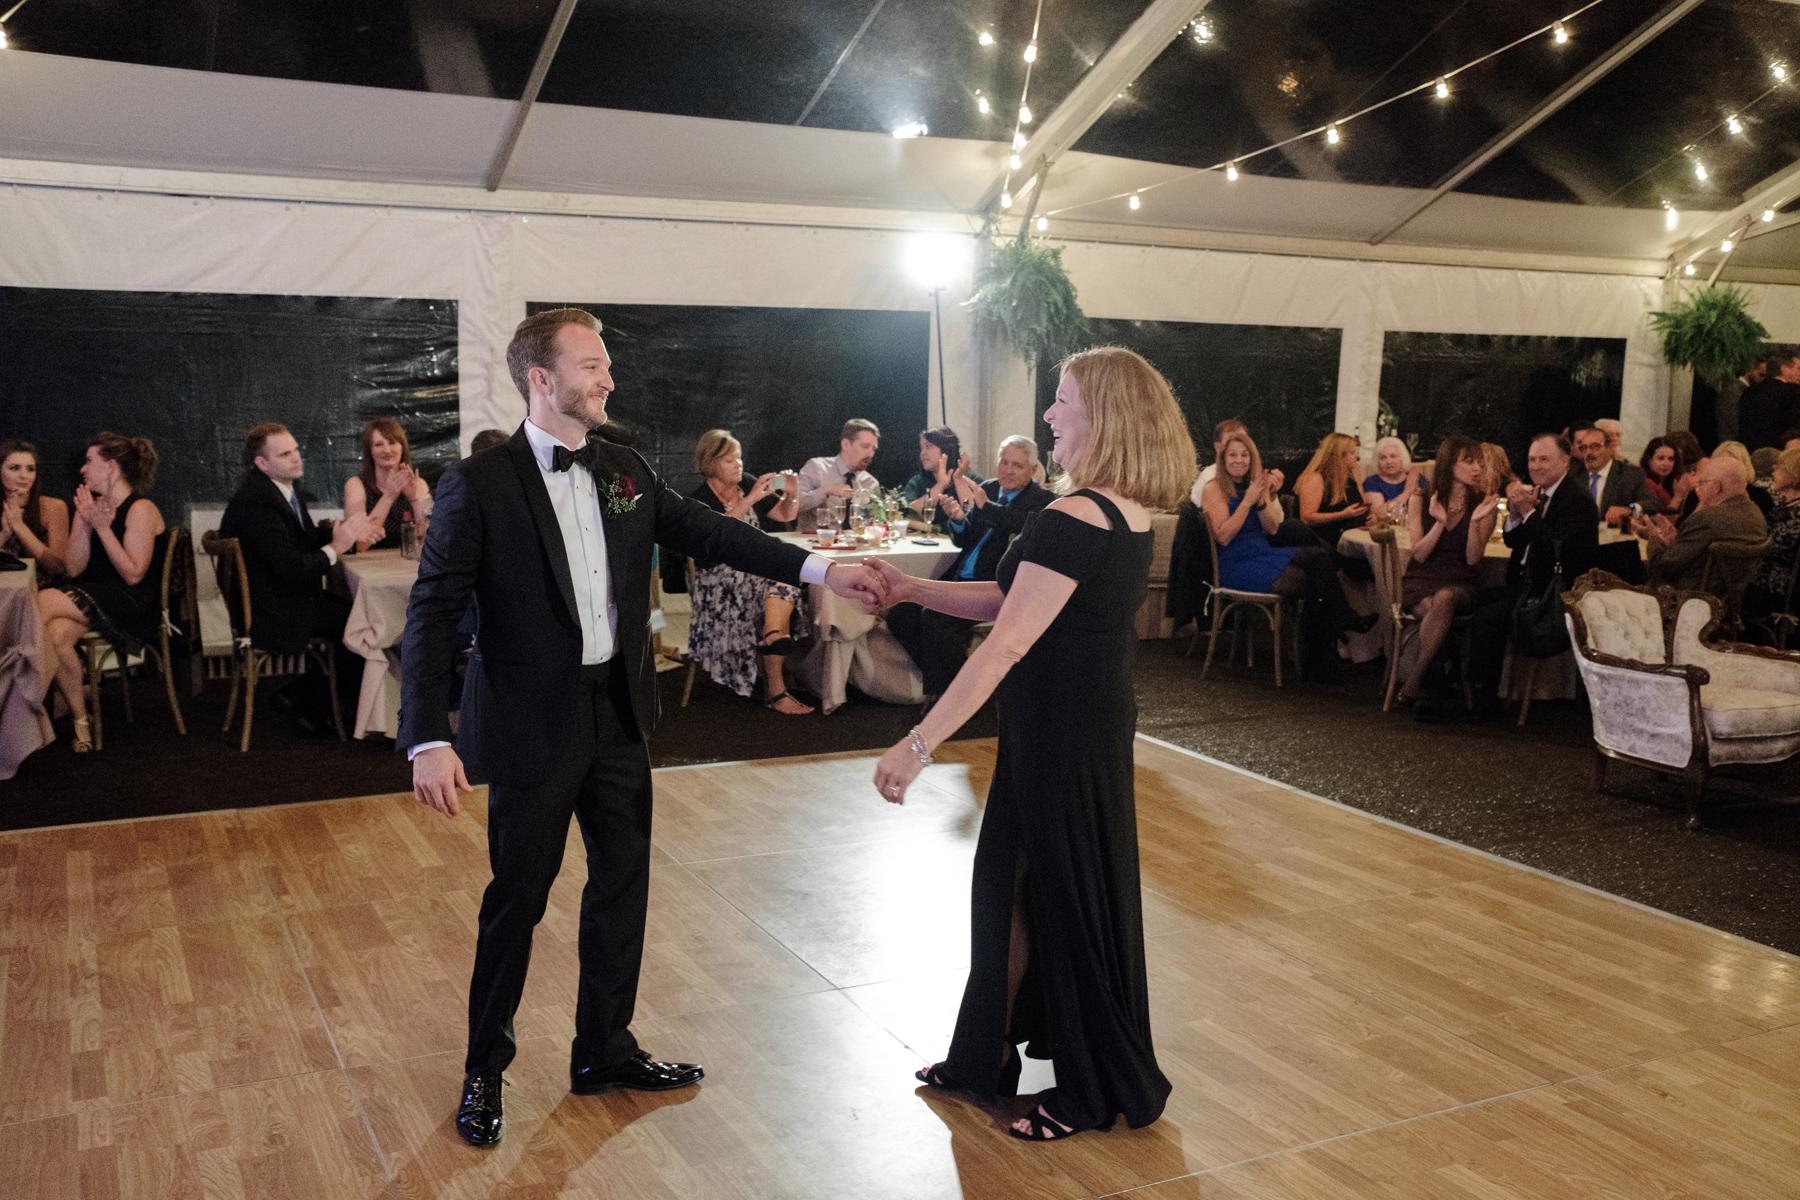 2017_BAP_KalliMatt_Gleneagles_CountryClub_Lemont_Wedding-80.jpg